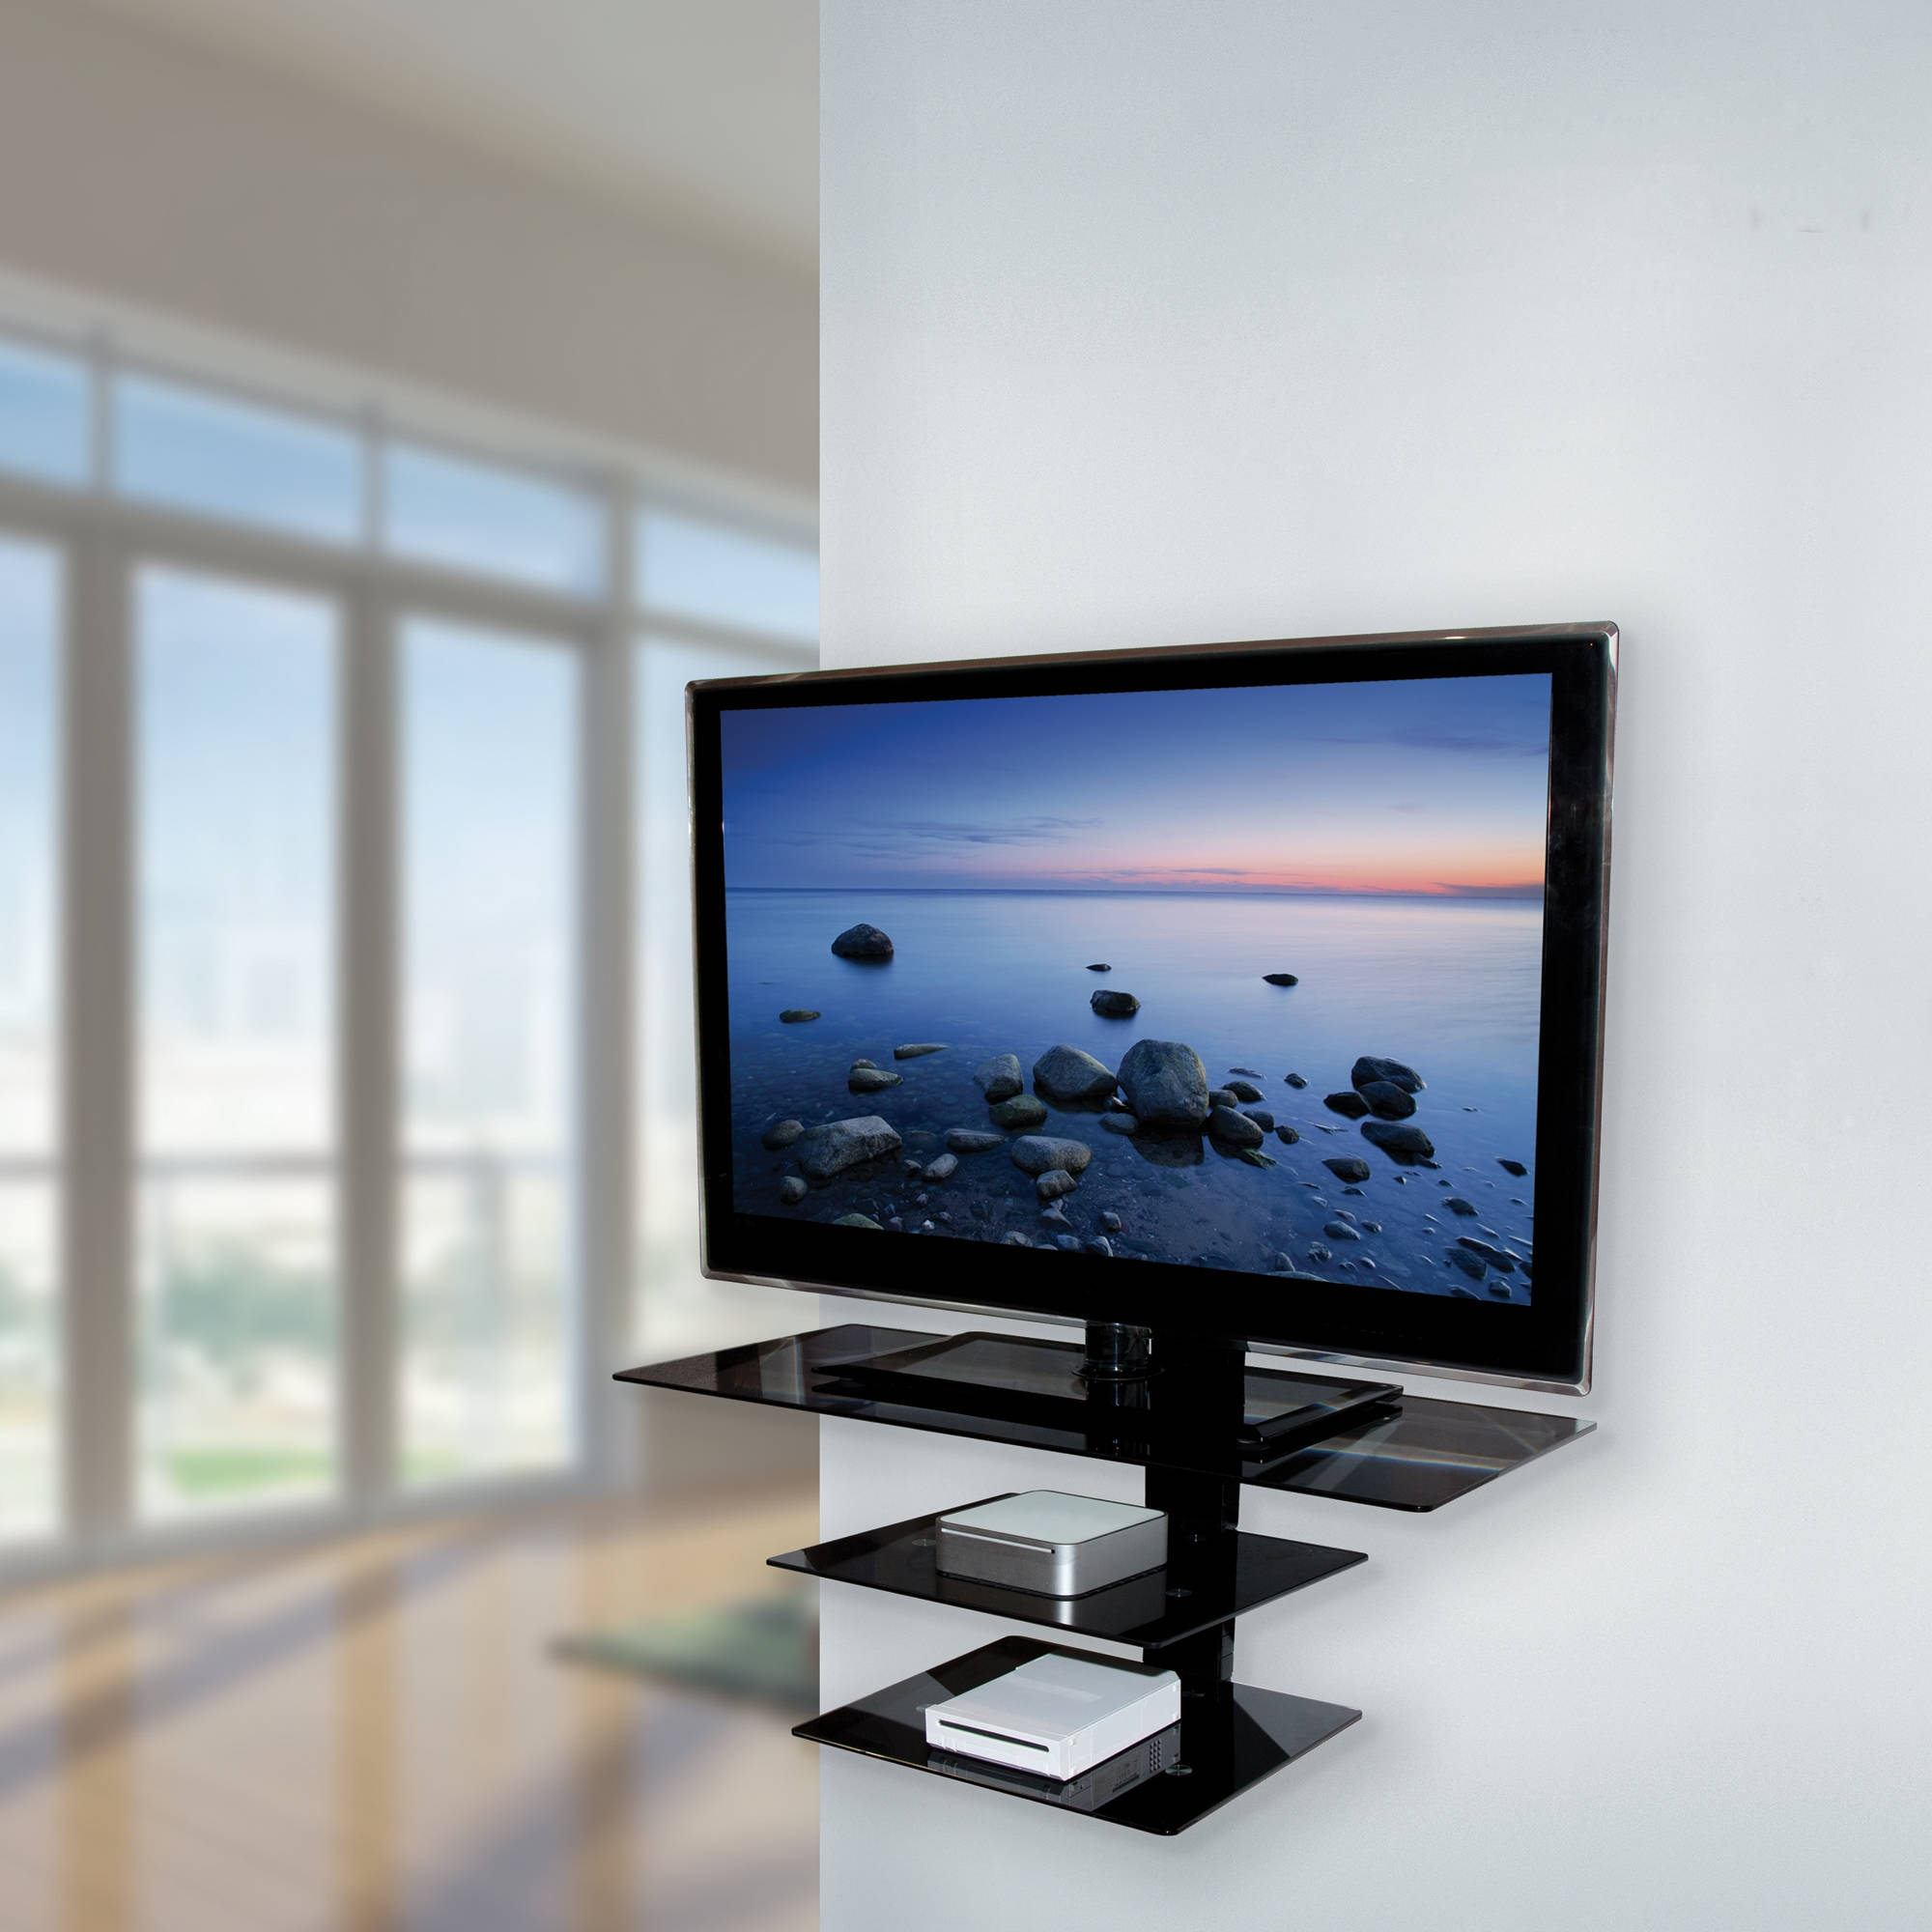 Wall Shelves Design Fabulous Glass Tv Shelves Wall Mount Flat Regarding Black Glass Shelves Wall Mounted (Image 14 of 15)